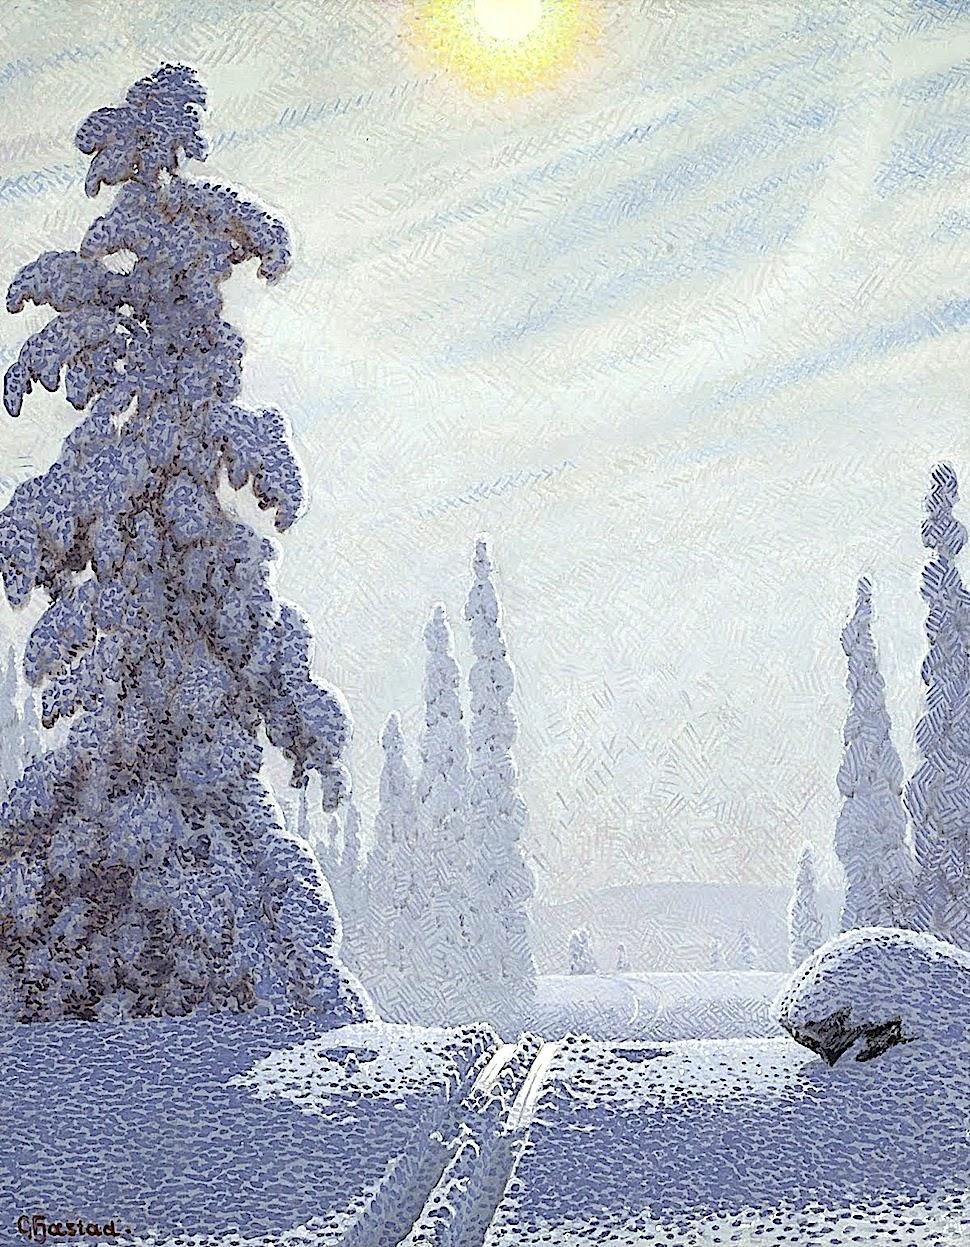 Gustaf Adolf Christensen Fjæstad art, a winter scene